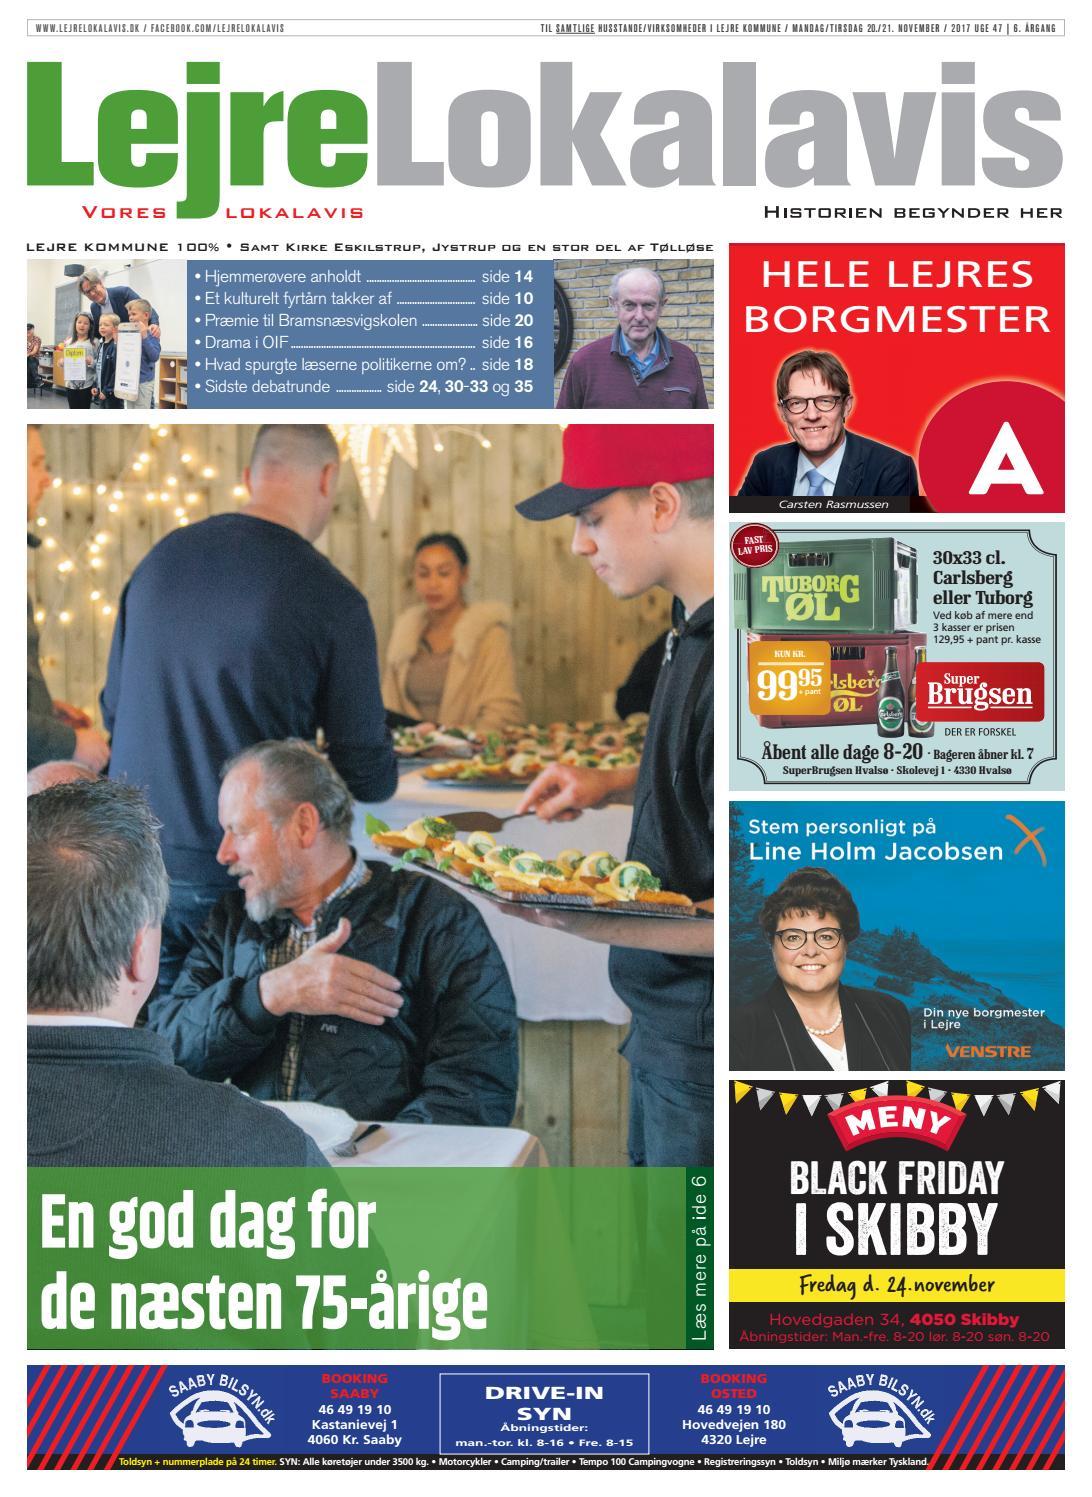 964704d98fc9 Lejre lokalavis uge 47 2017 by Lejre Lokalavis - issuu